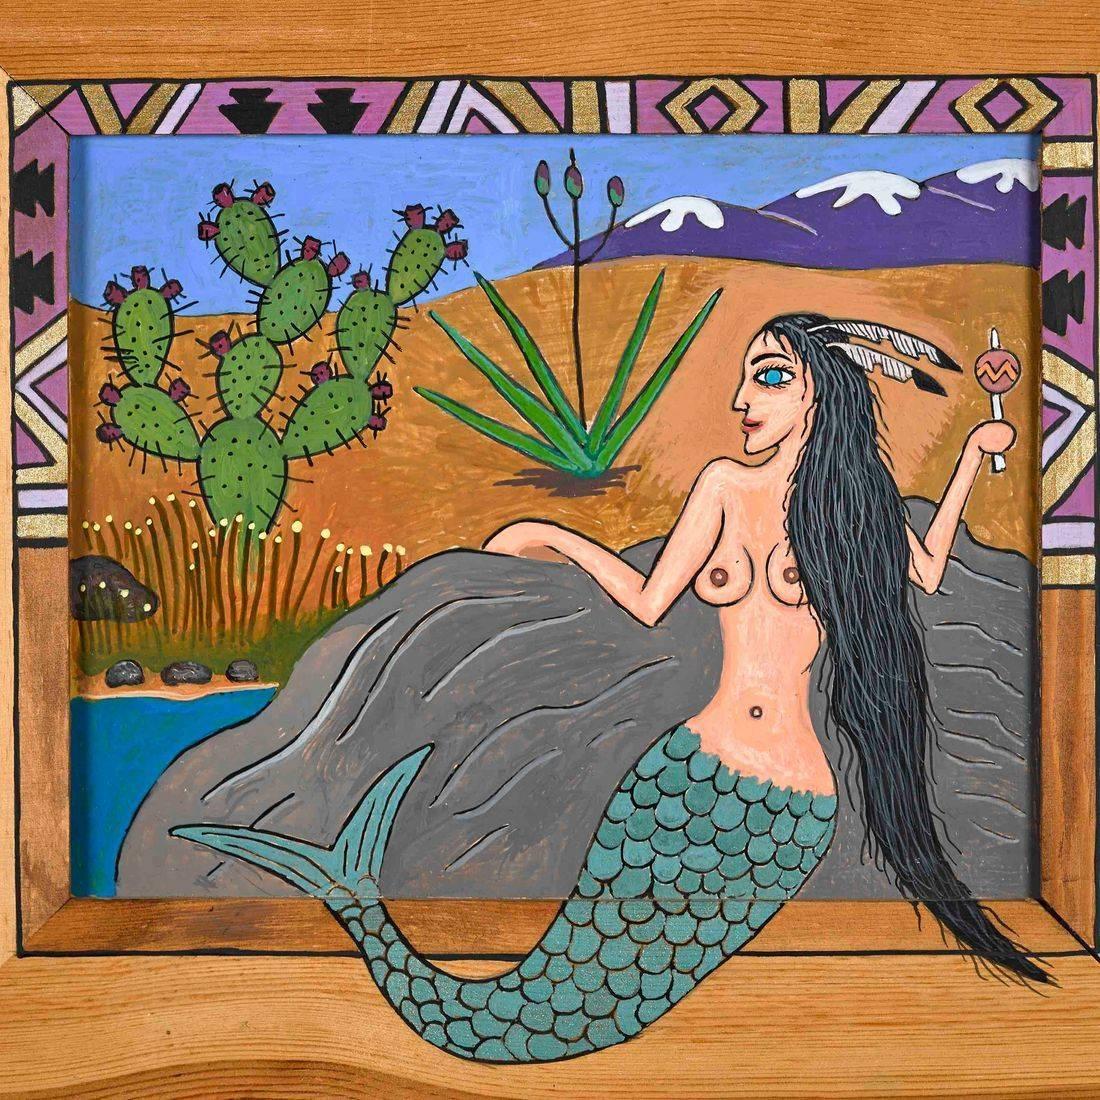 Mermaid, Arroyo, Saguaro, Cactus, Desert, Sexy Woman, Pop Culture, Pop Art, Contemporary Art